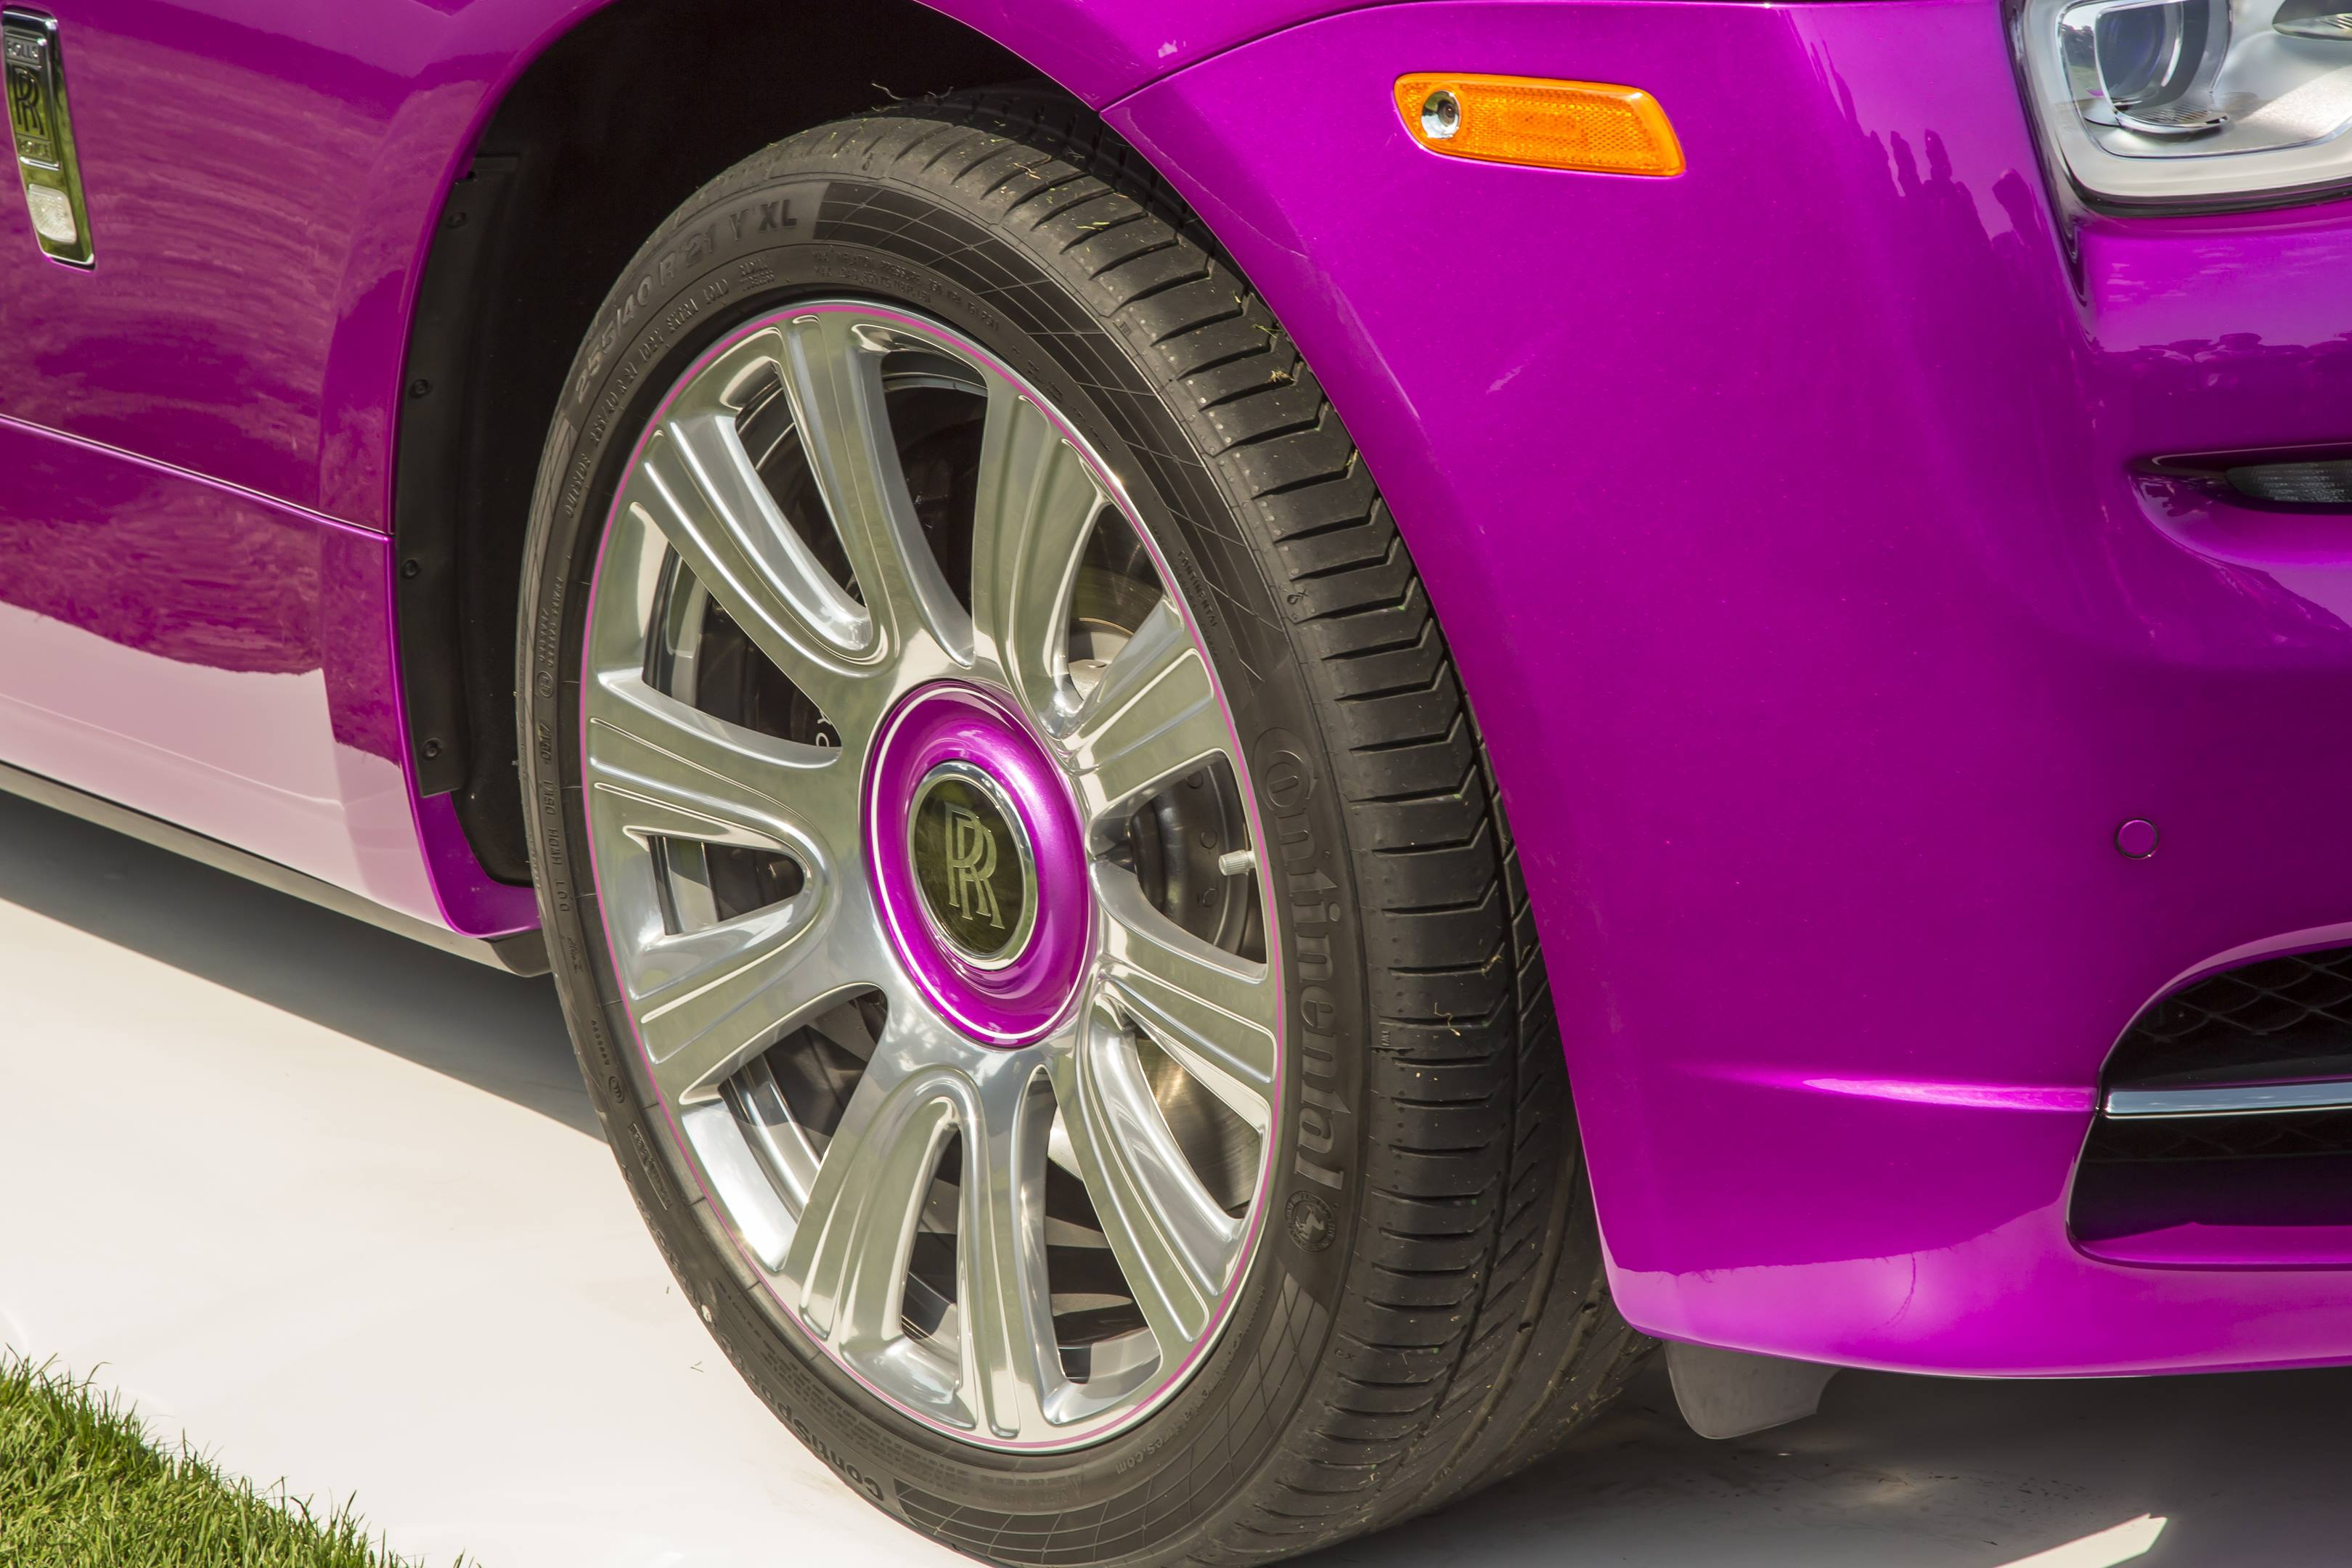 Michael Fux's Rolls-Royce Dawn convertible wheel detail